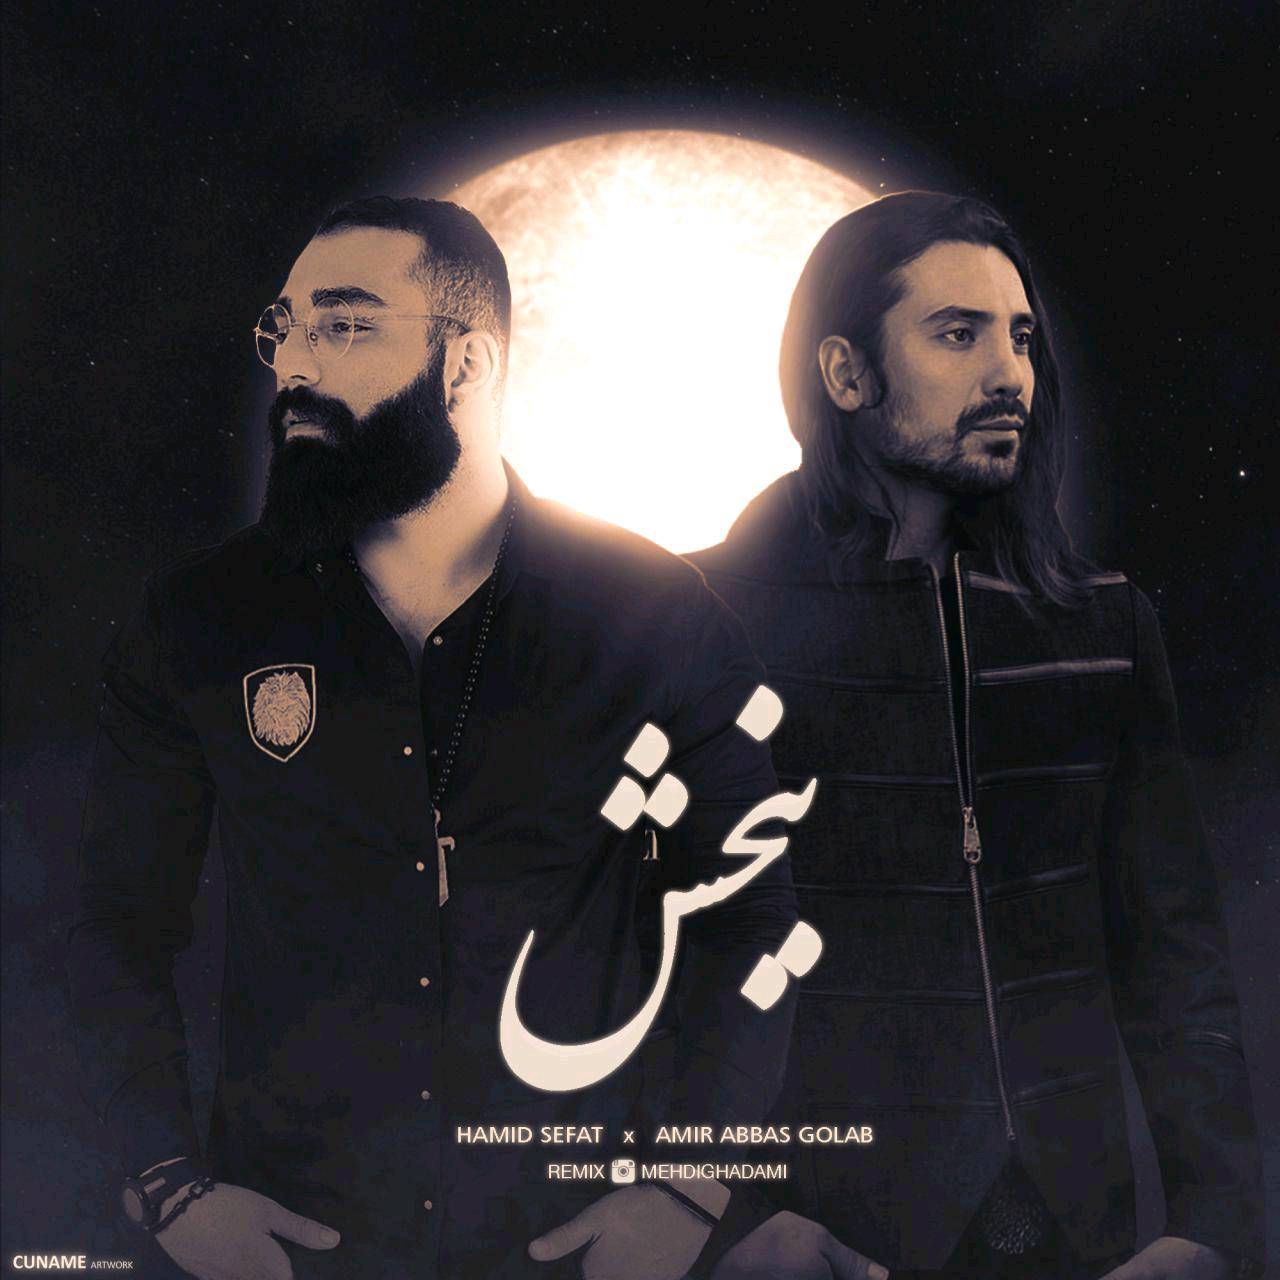 Amirabbas Golab & Hamid Sefat – Bakhshesh New Version